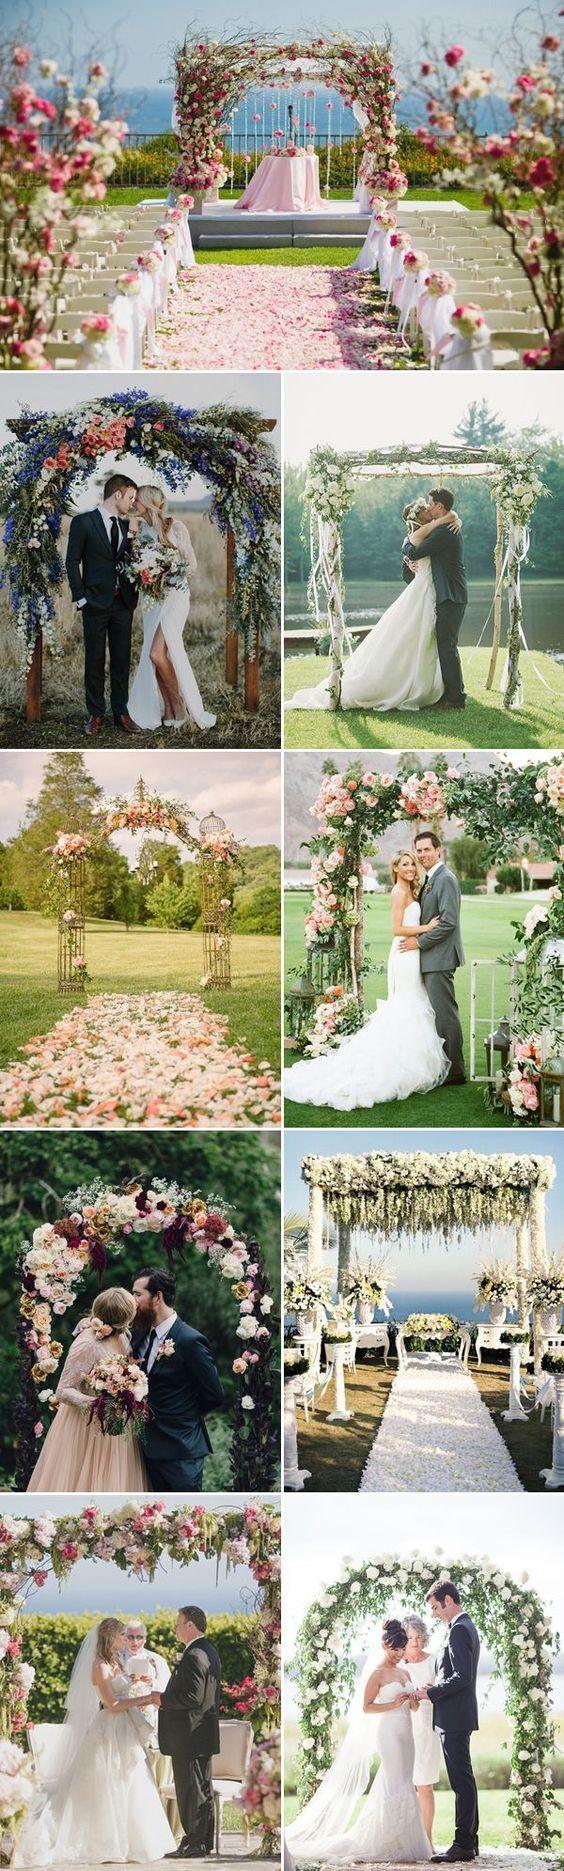 50 beautiful wedding arch decoration ideas weddings wedding and 50 beautiful wedding arch decoration ideas junglespirit Image collections